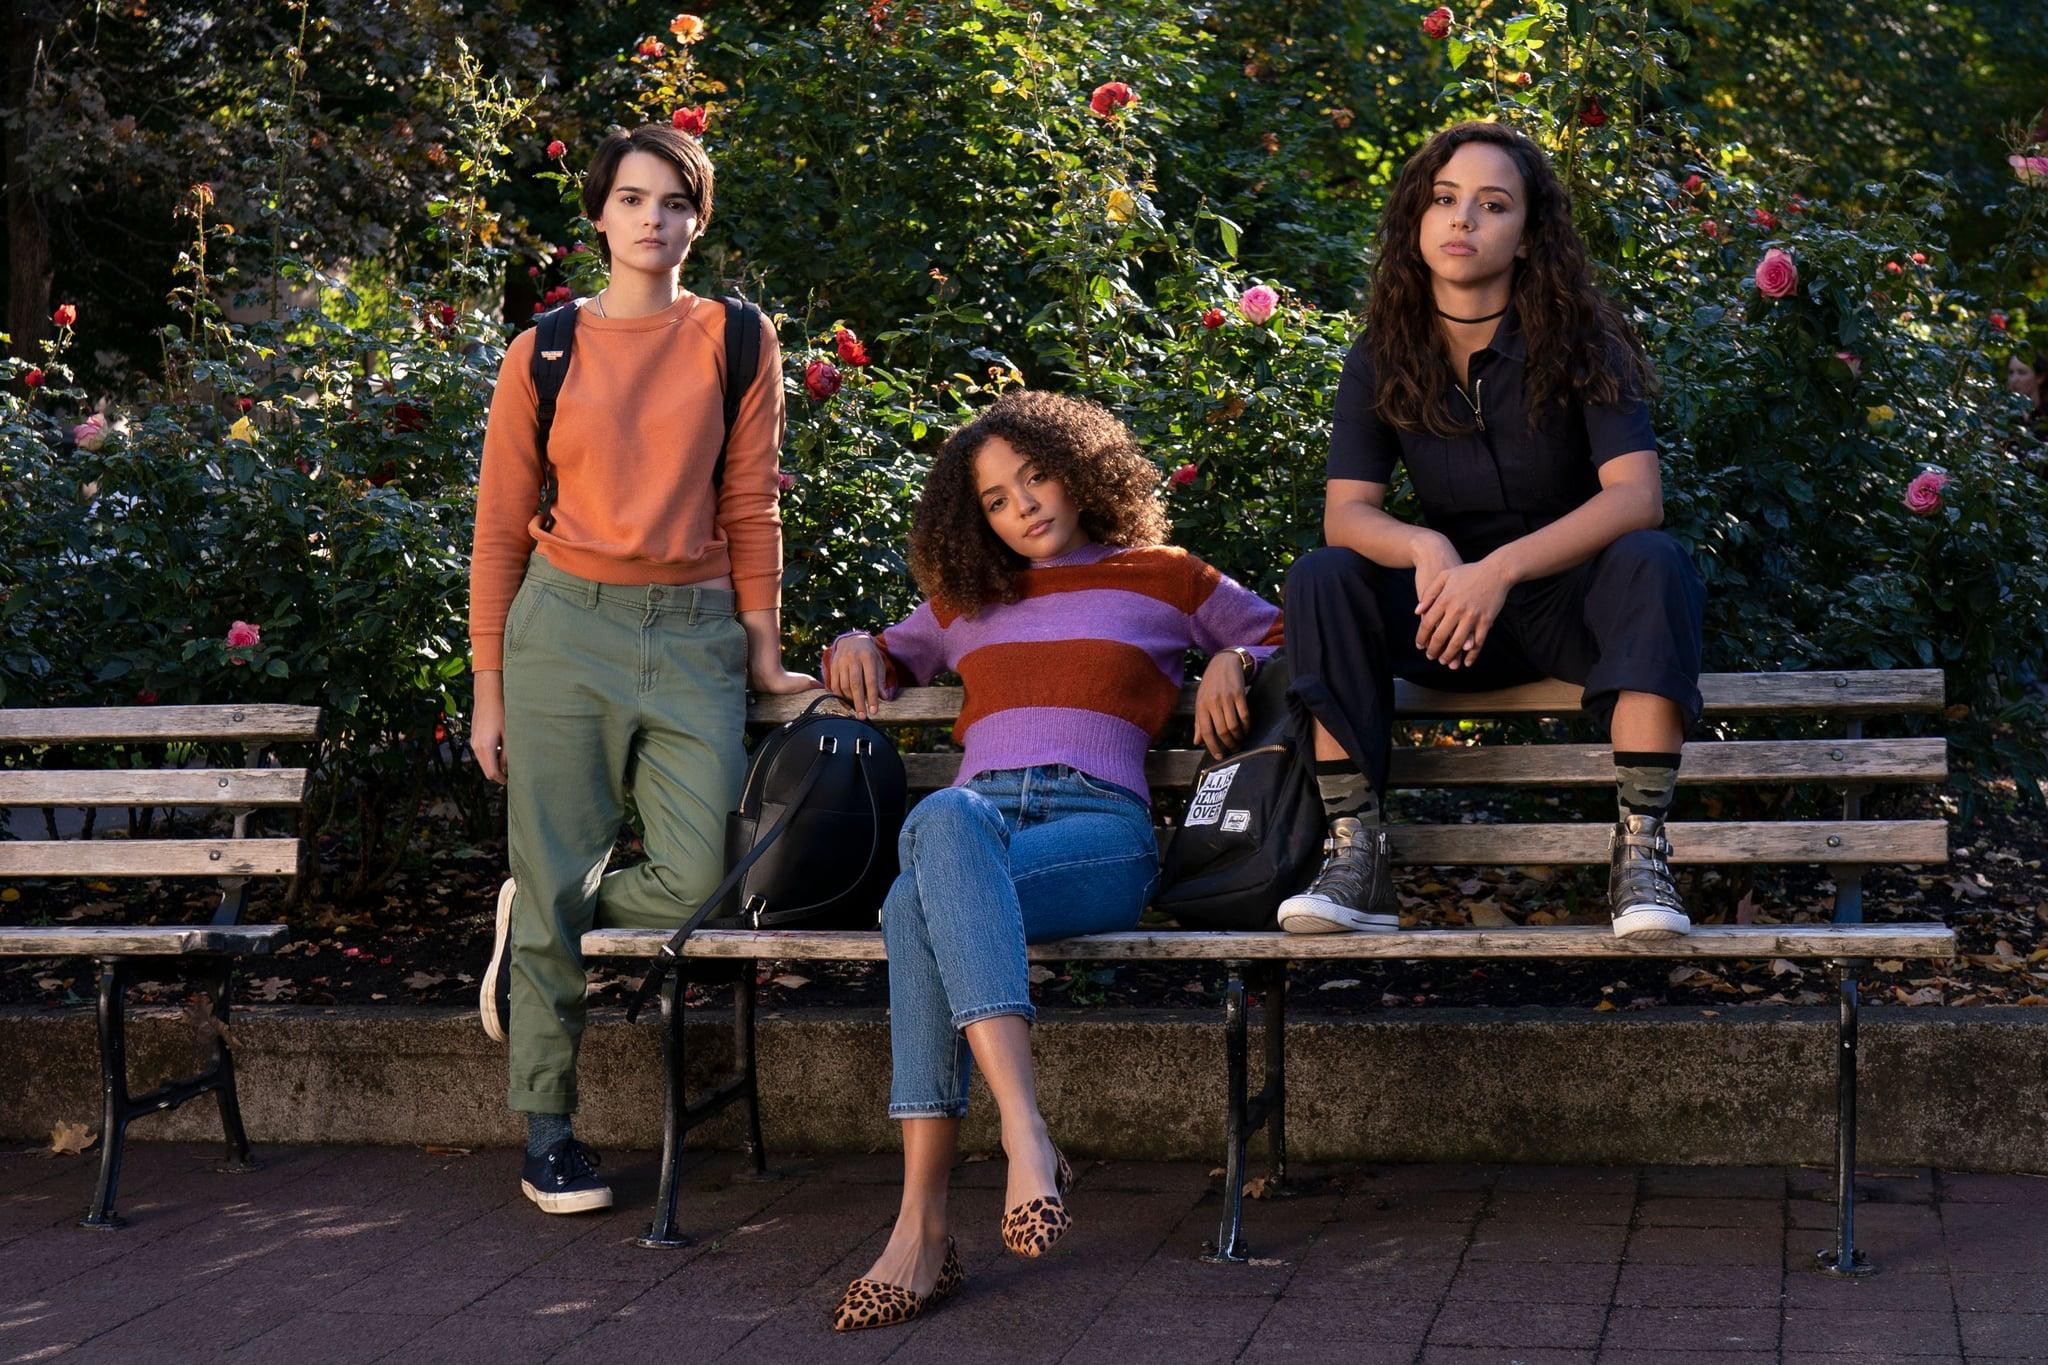 TRINKETS, from left: Brianna Hildebrand, Quintessa Swindell, Kiana Madeira in 'Mirrors', (Season 1, Episode 101, aired June 14, 2019), ph: Allyson Riggs / Netflix / Courtesy Everett Collection